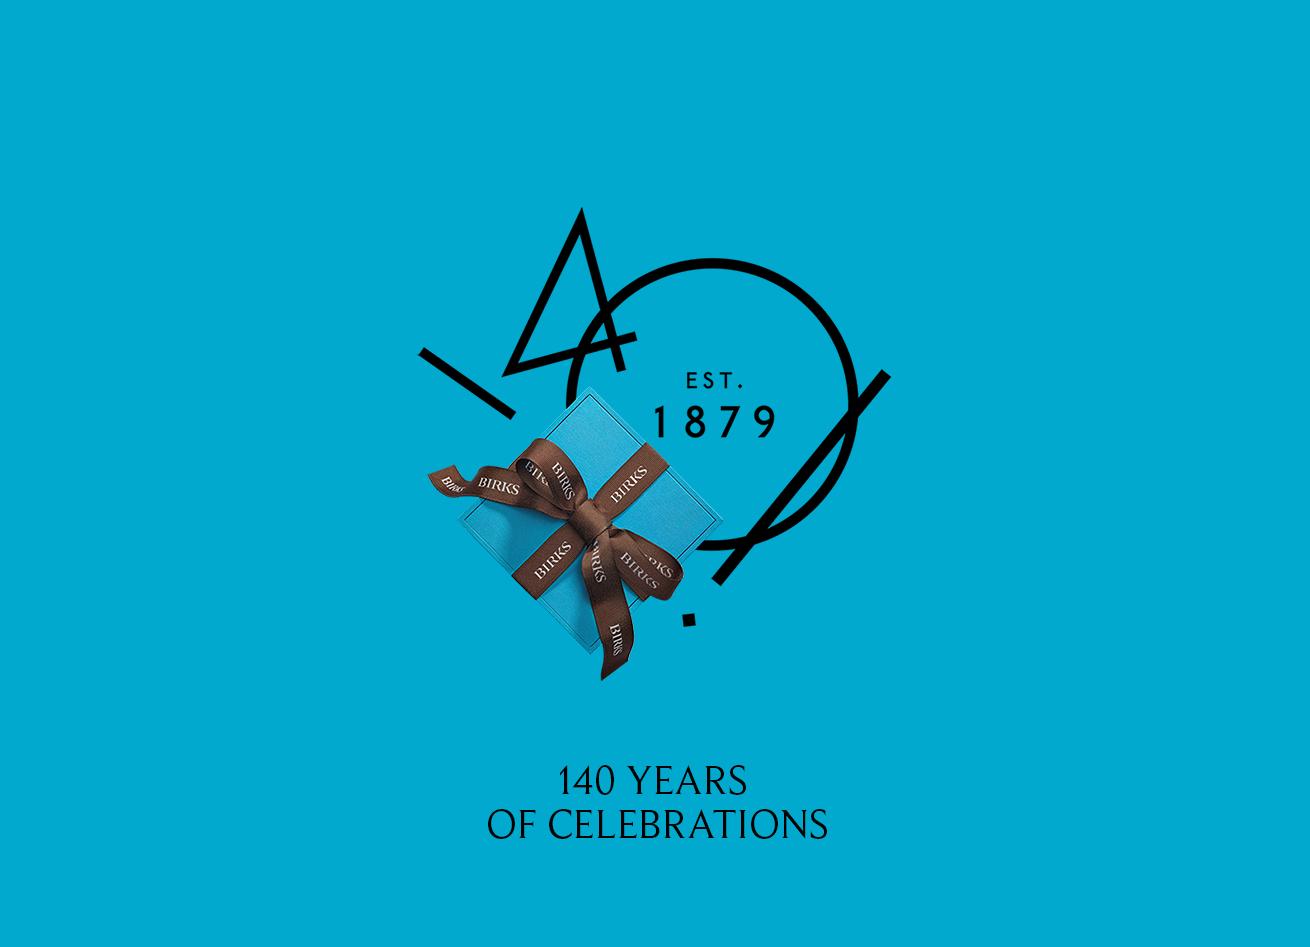 The Birks 140th anniversary logo and signature